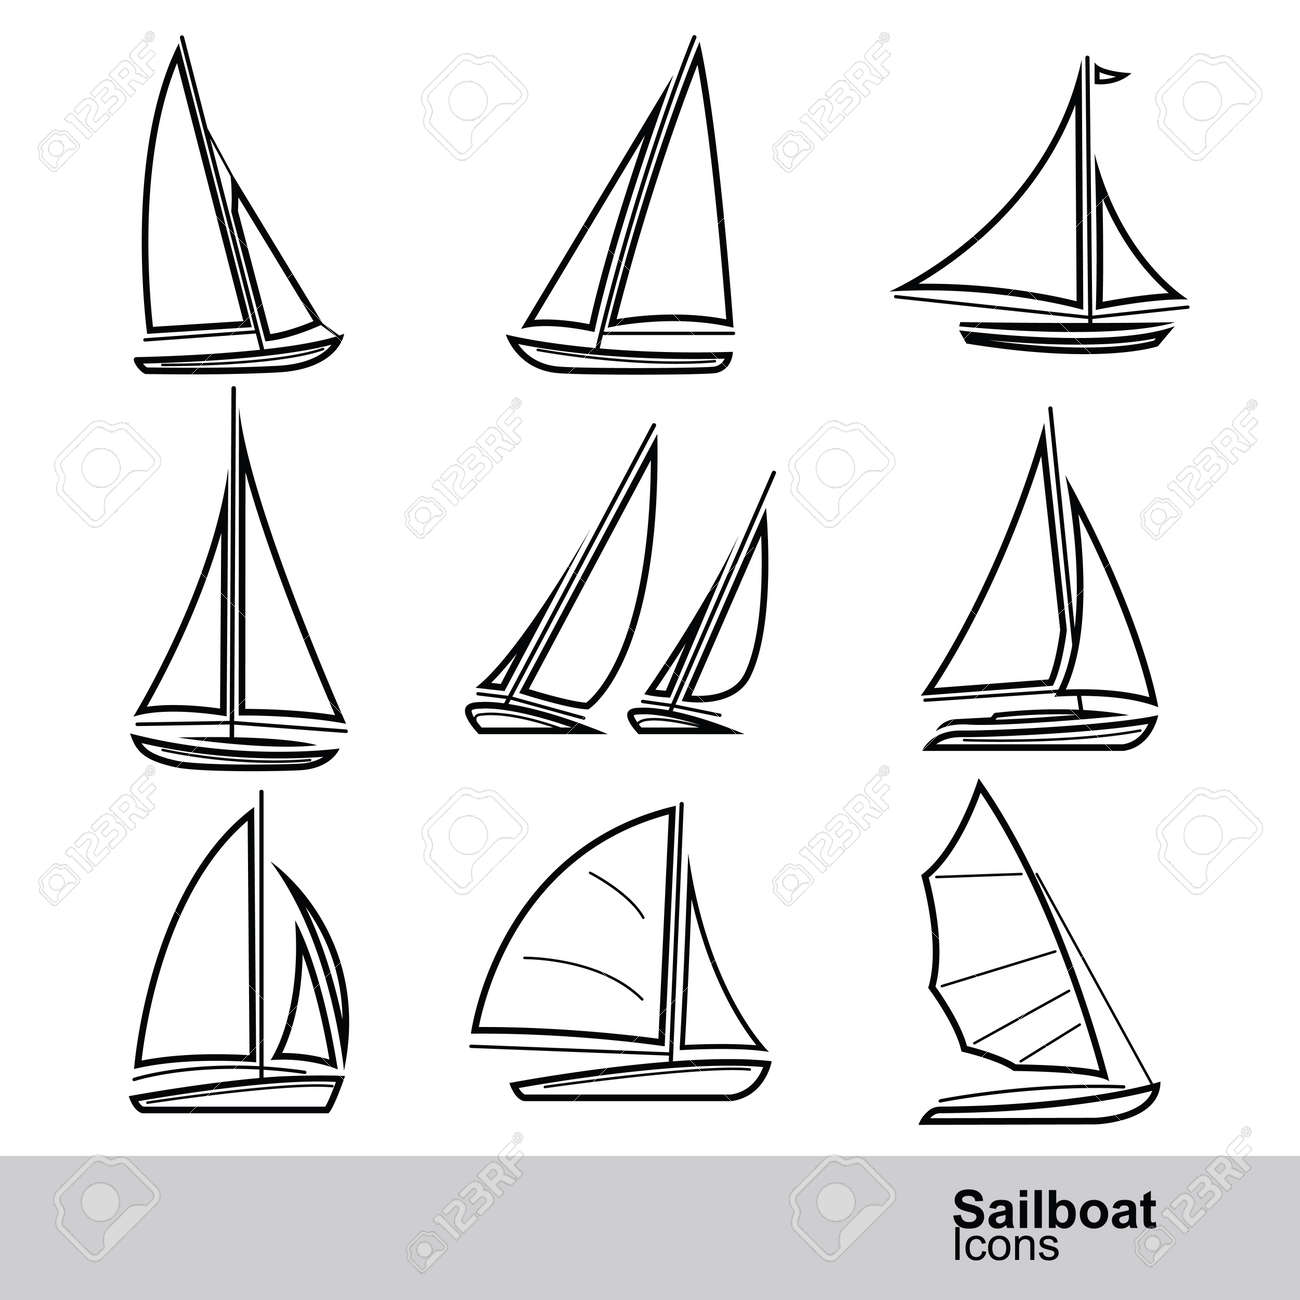 sailboat line icon set ,vector illustration - 45013894